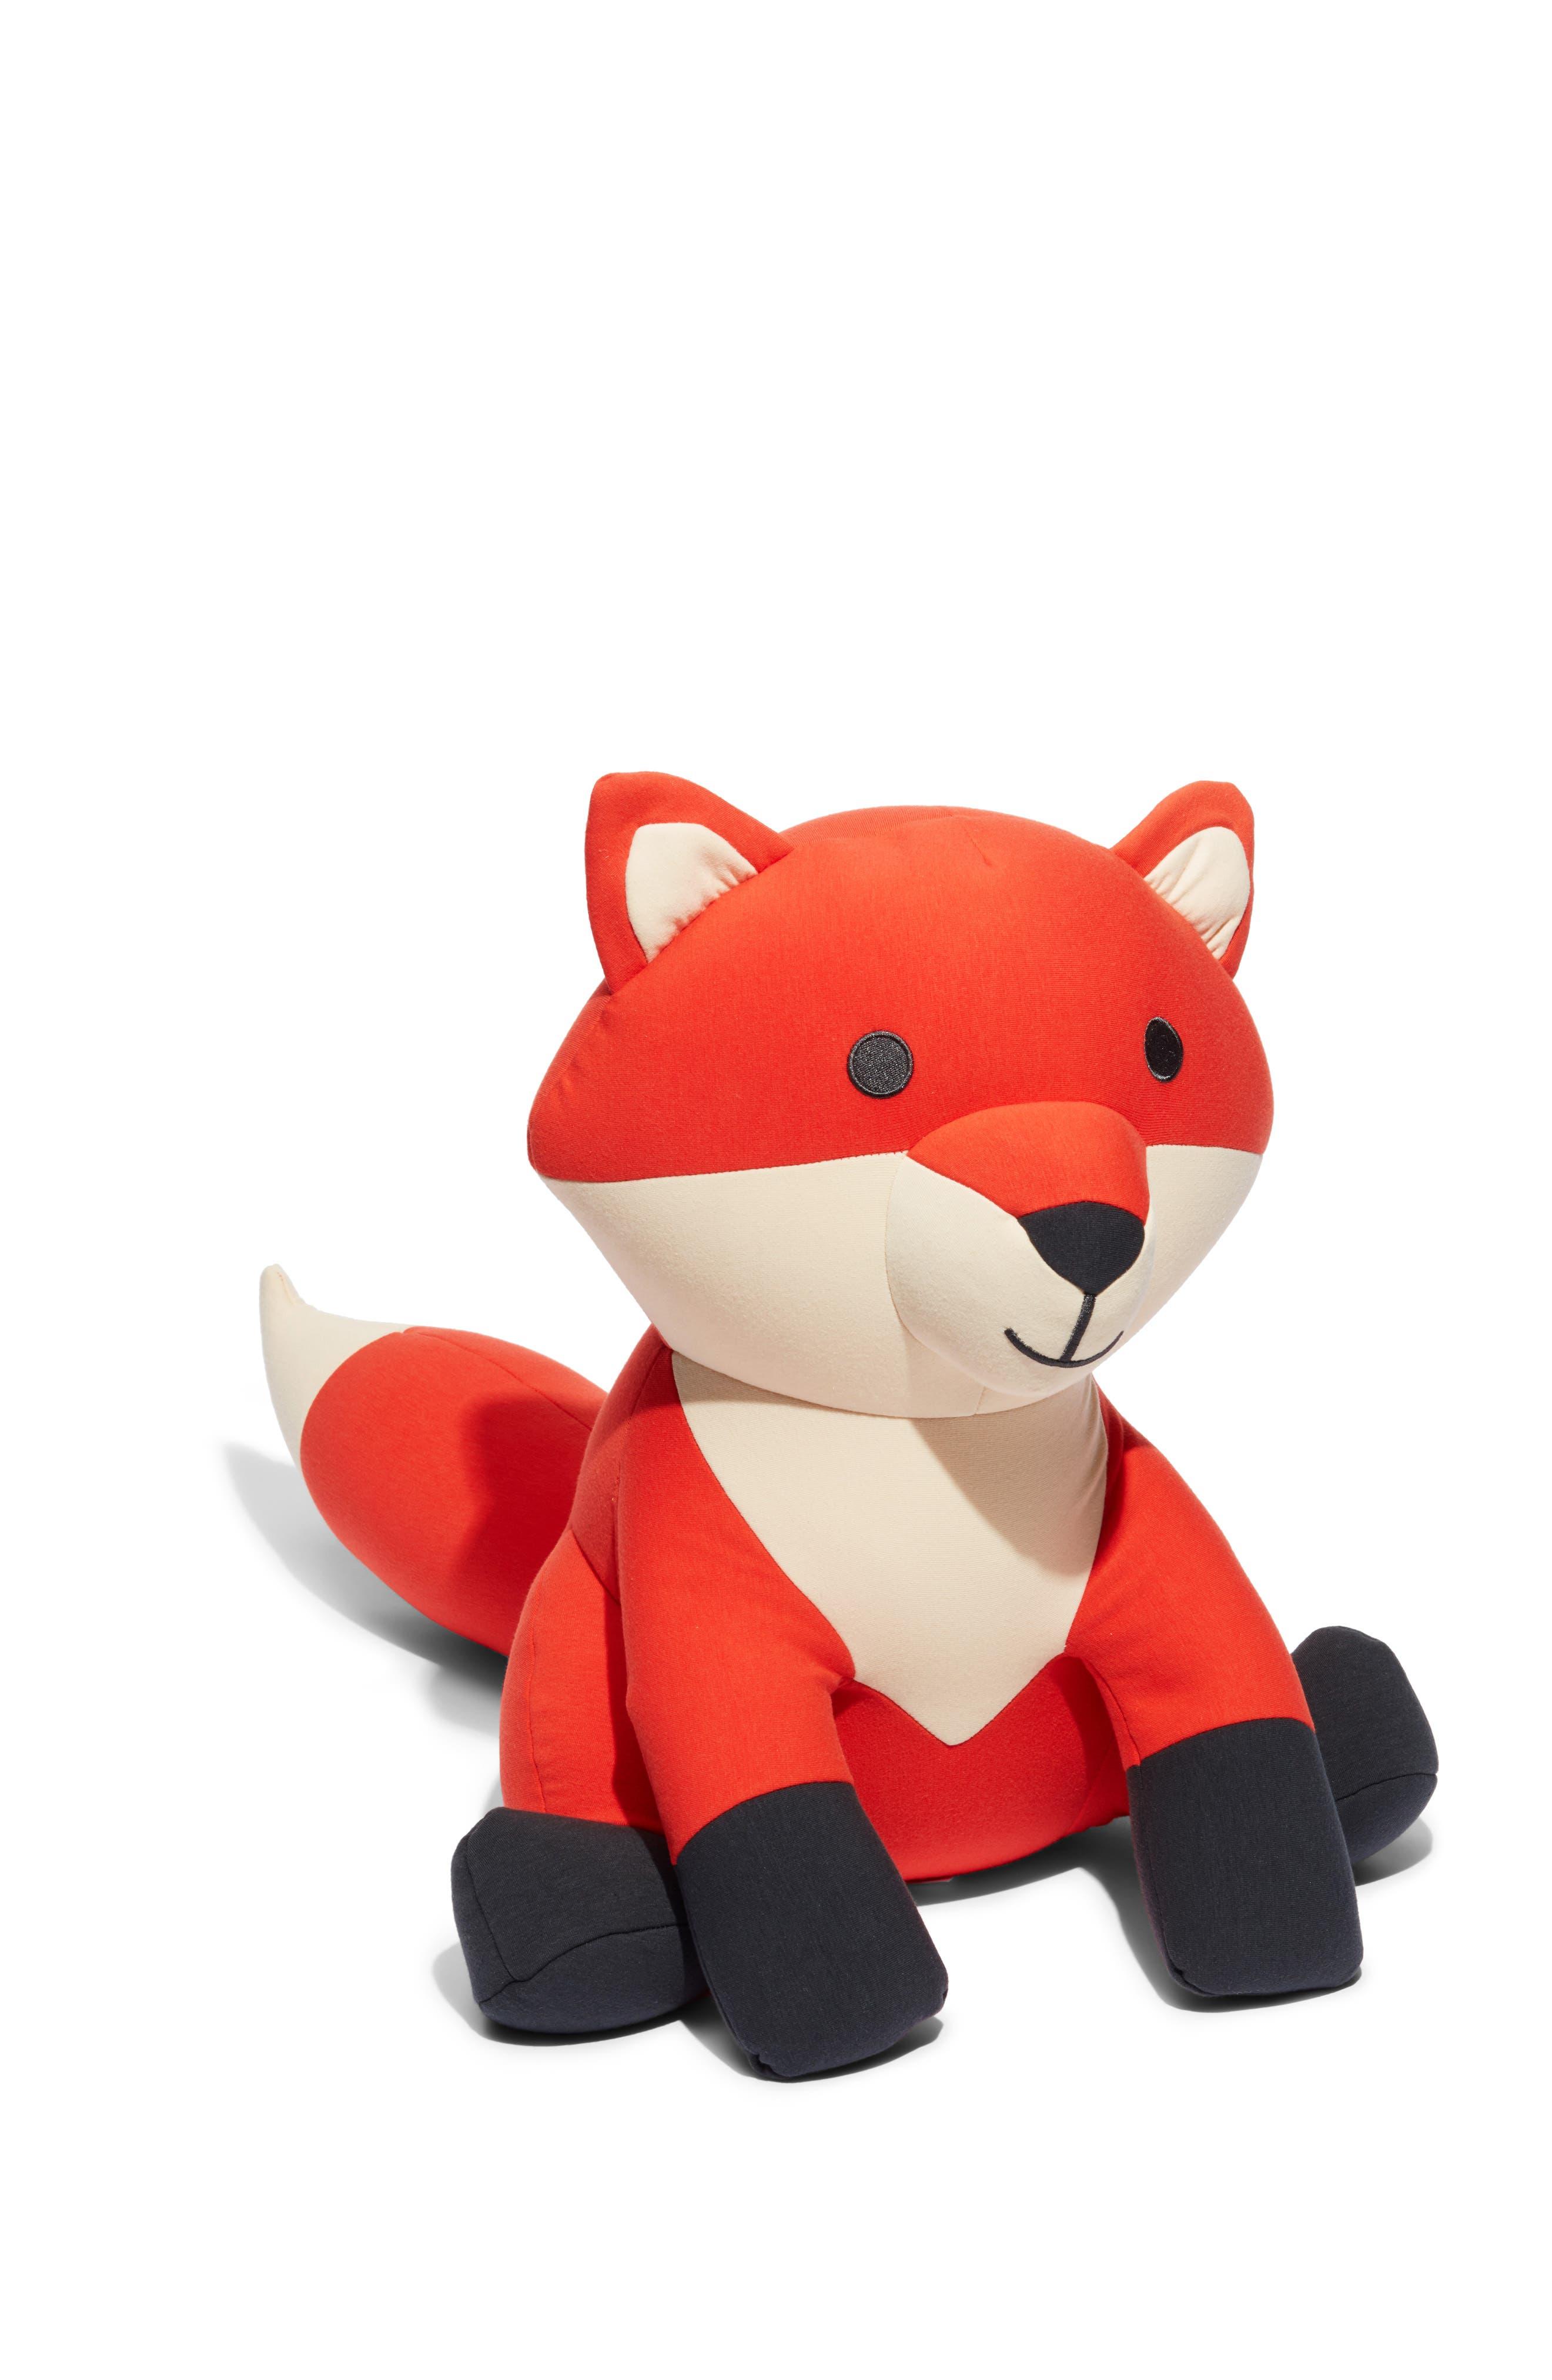 Mega Mate Stuffed Animal Toy,                             Main thumbnail 1, color,                             ORANGE